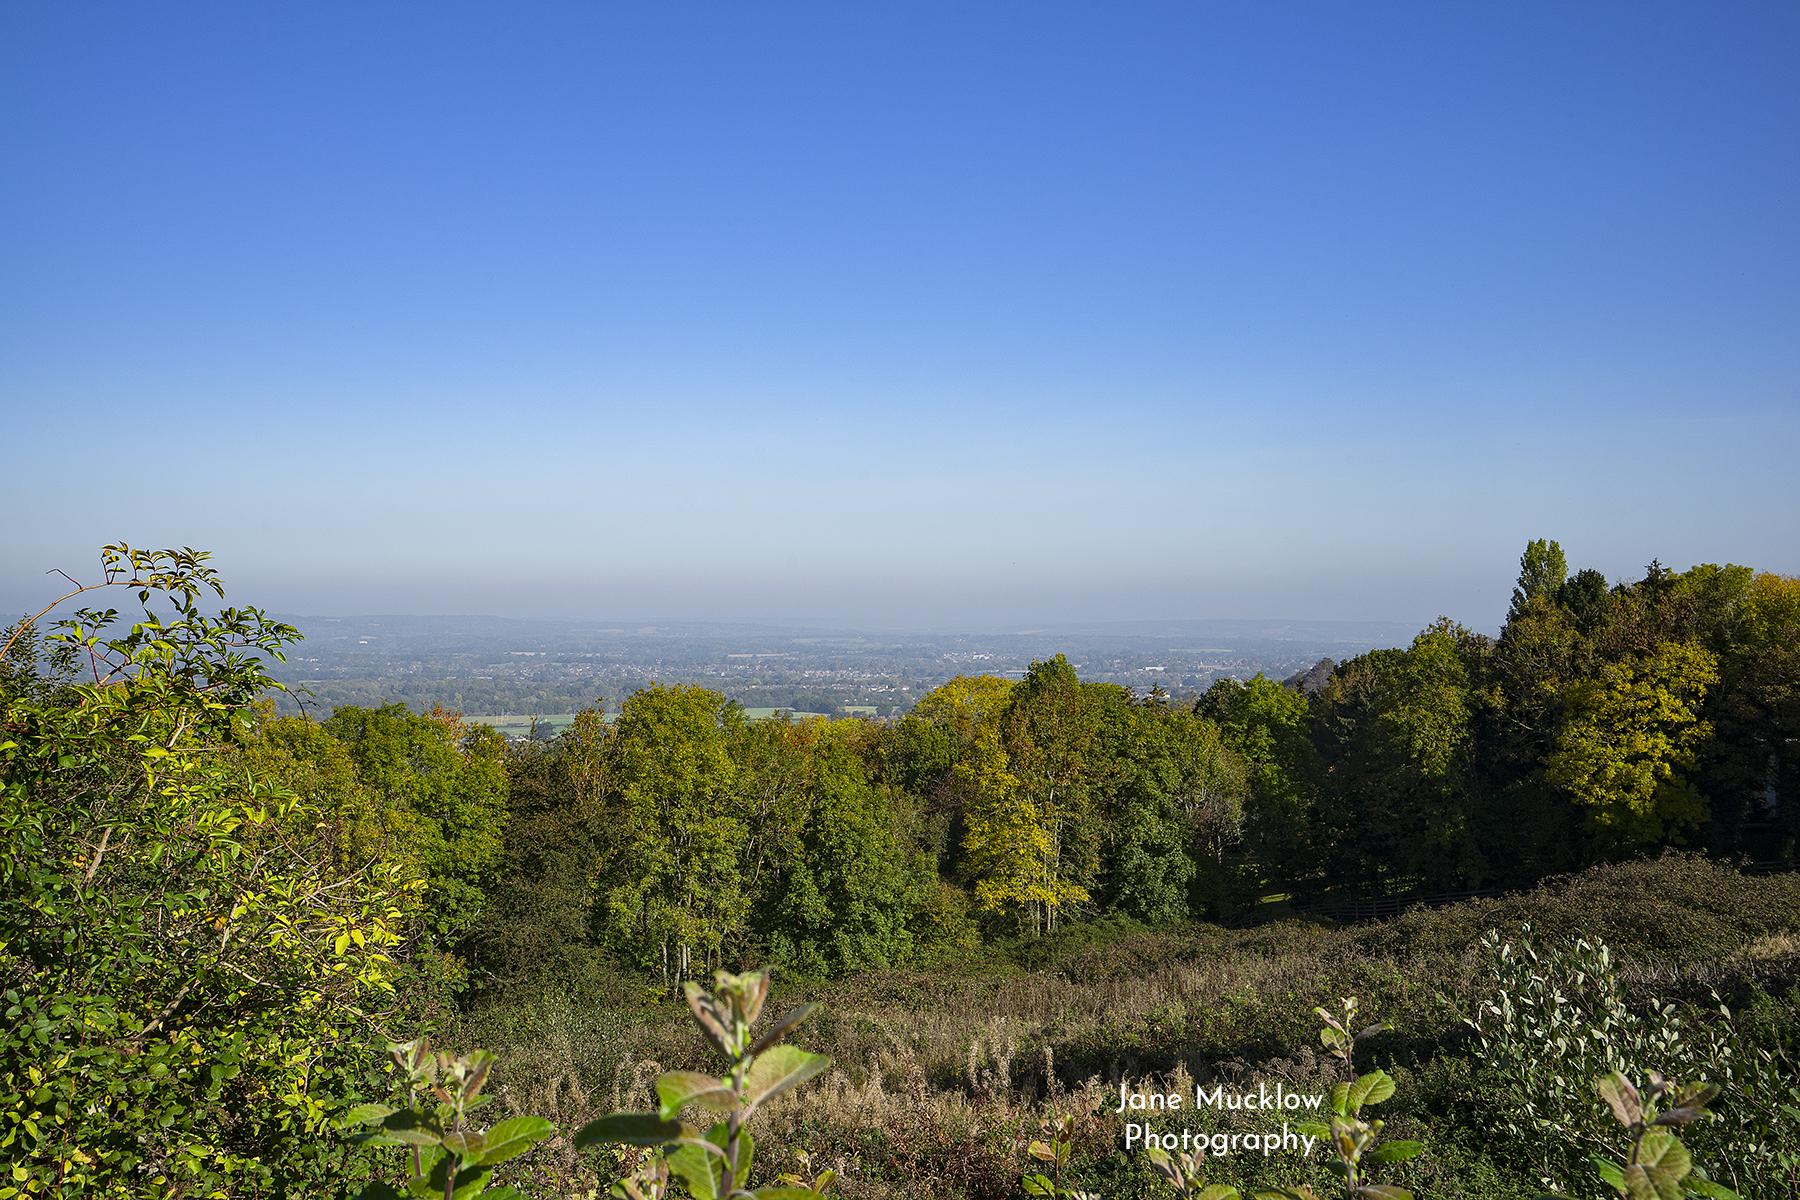 Photo by Jane Mucklow of an Autumn view across Tonbridge from Bidborough Ridge